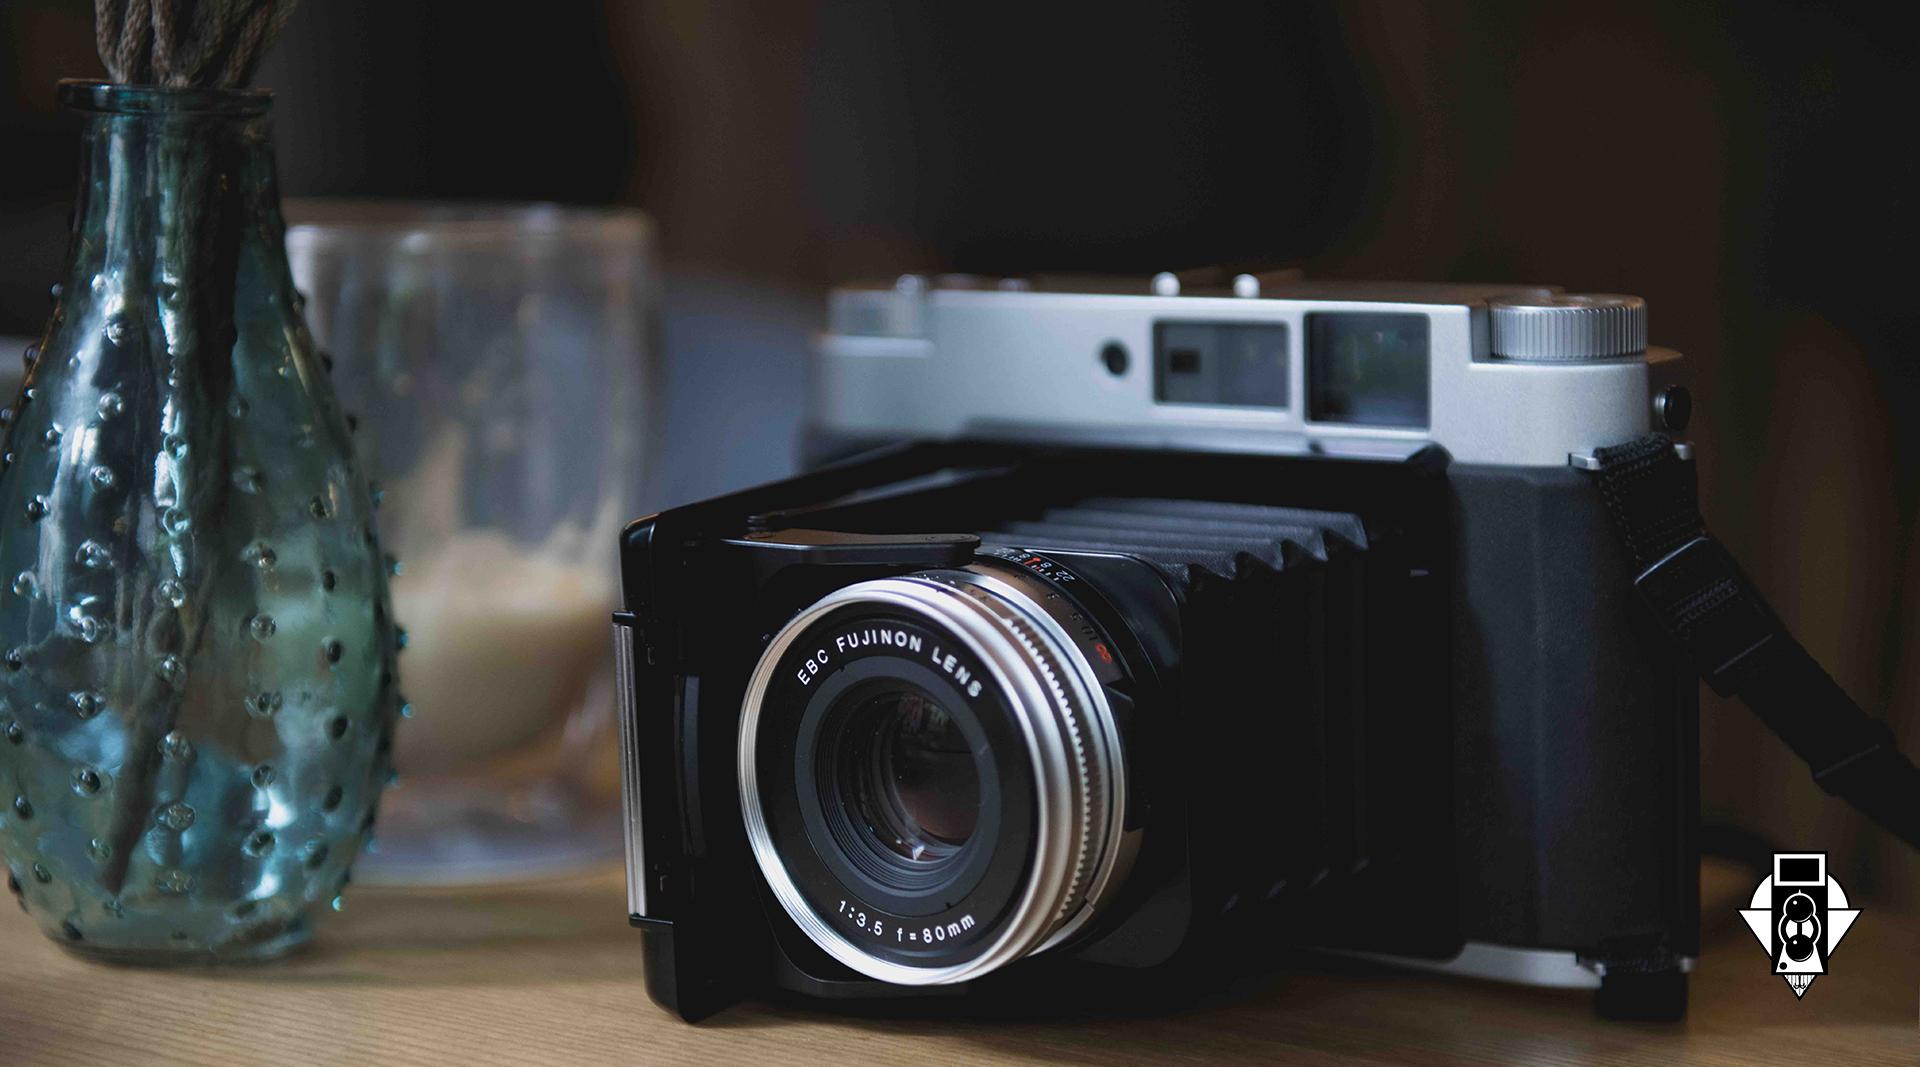 Voigtlander Bessa 667 / Fujifilm GF670. Складная среднеформатная камера